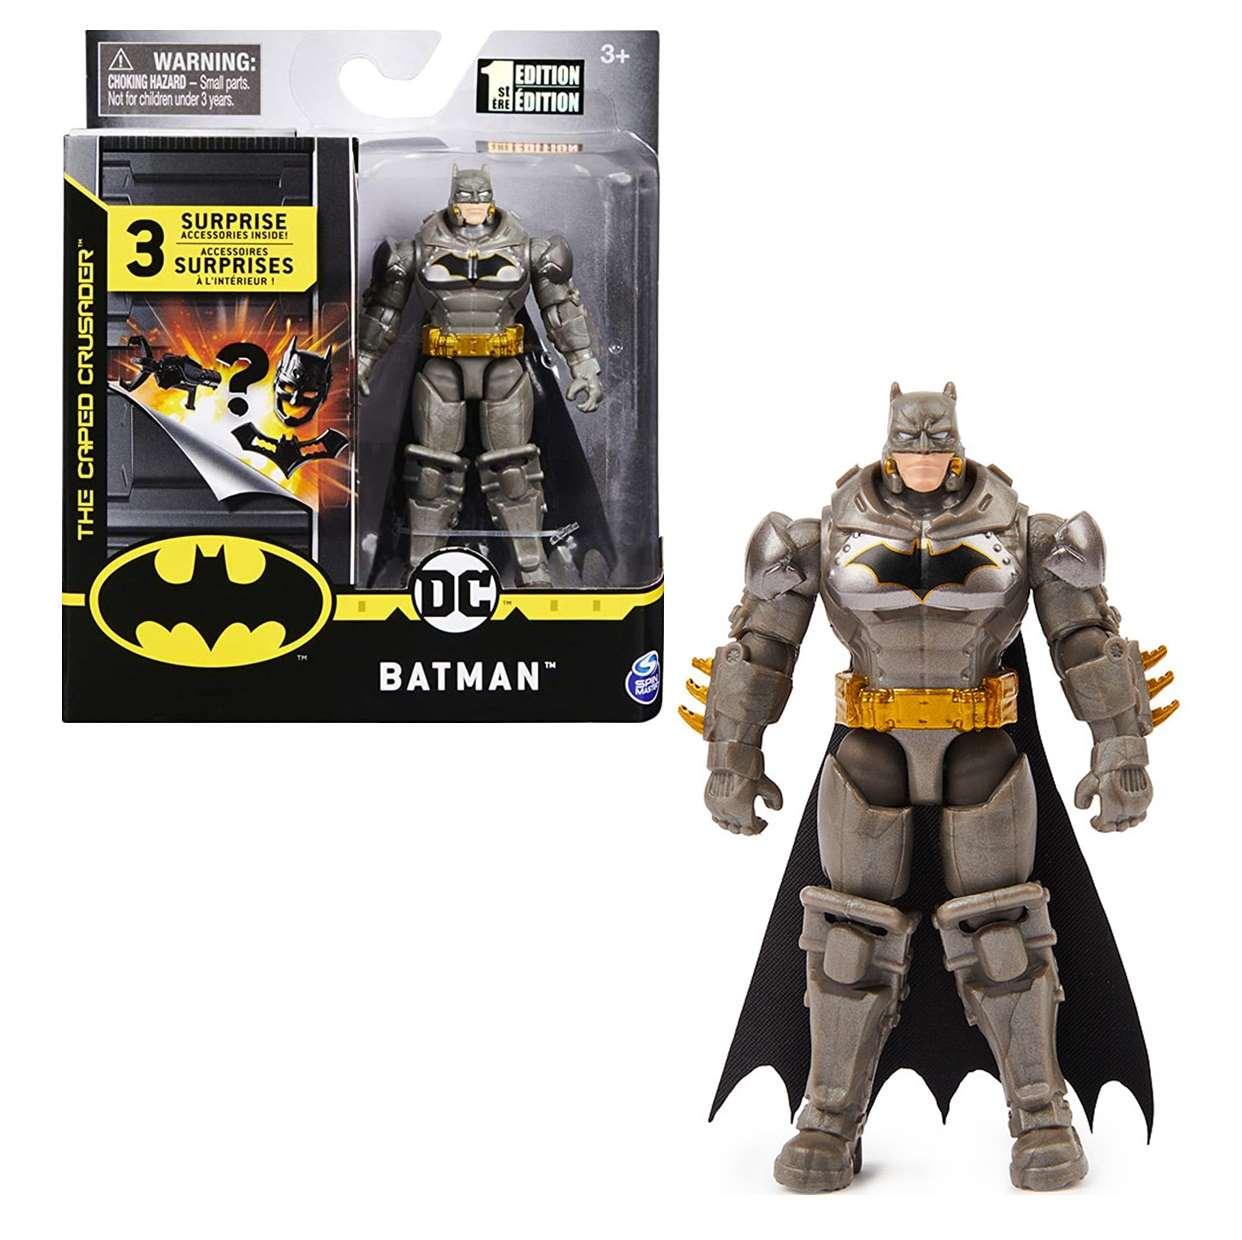 Batman Armor Gray Figura The Caped Crusader Spin Master